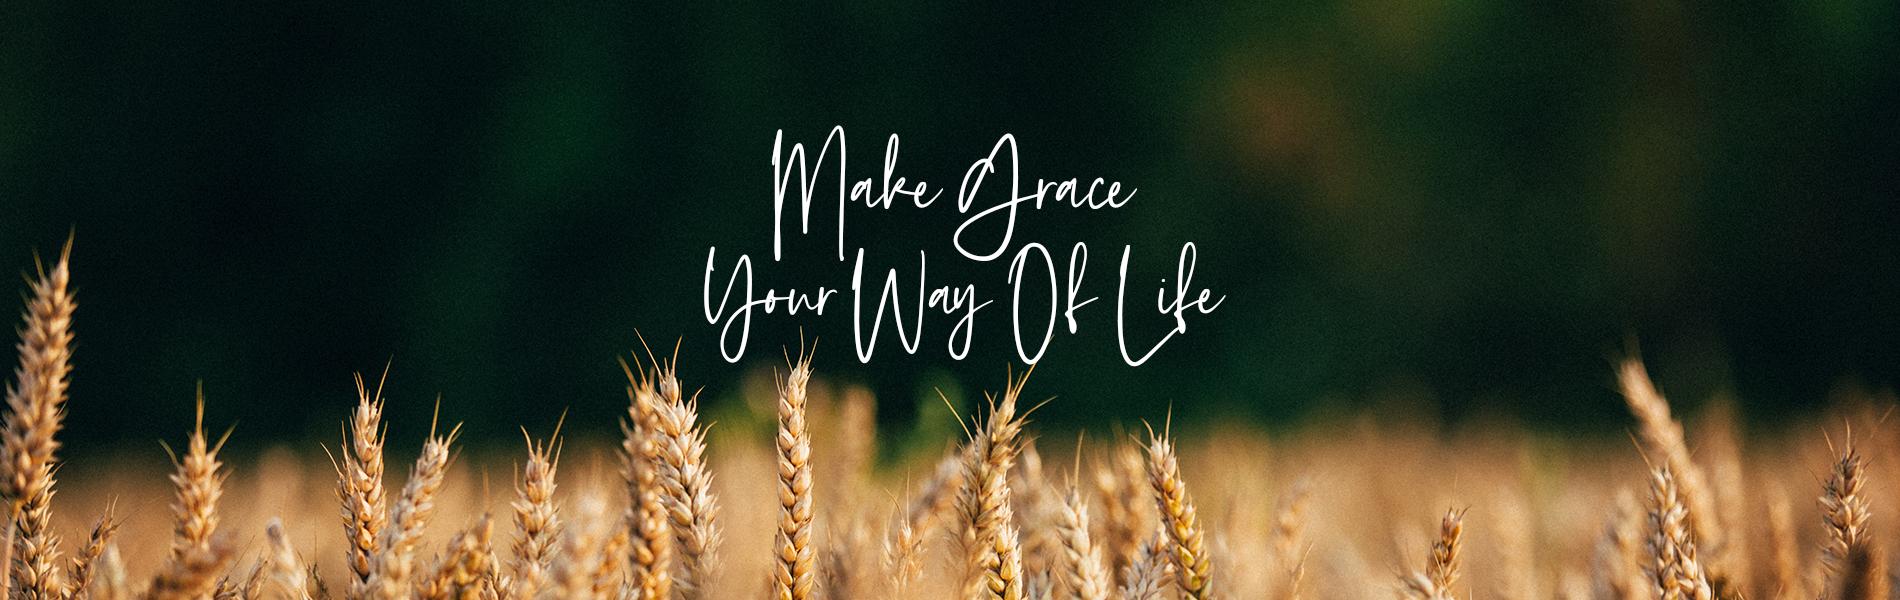 Apr_Make_Grace_Way_of_Life_EN New Creation TV